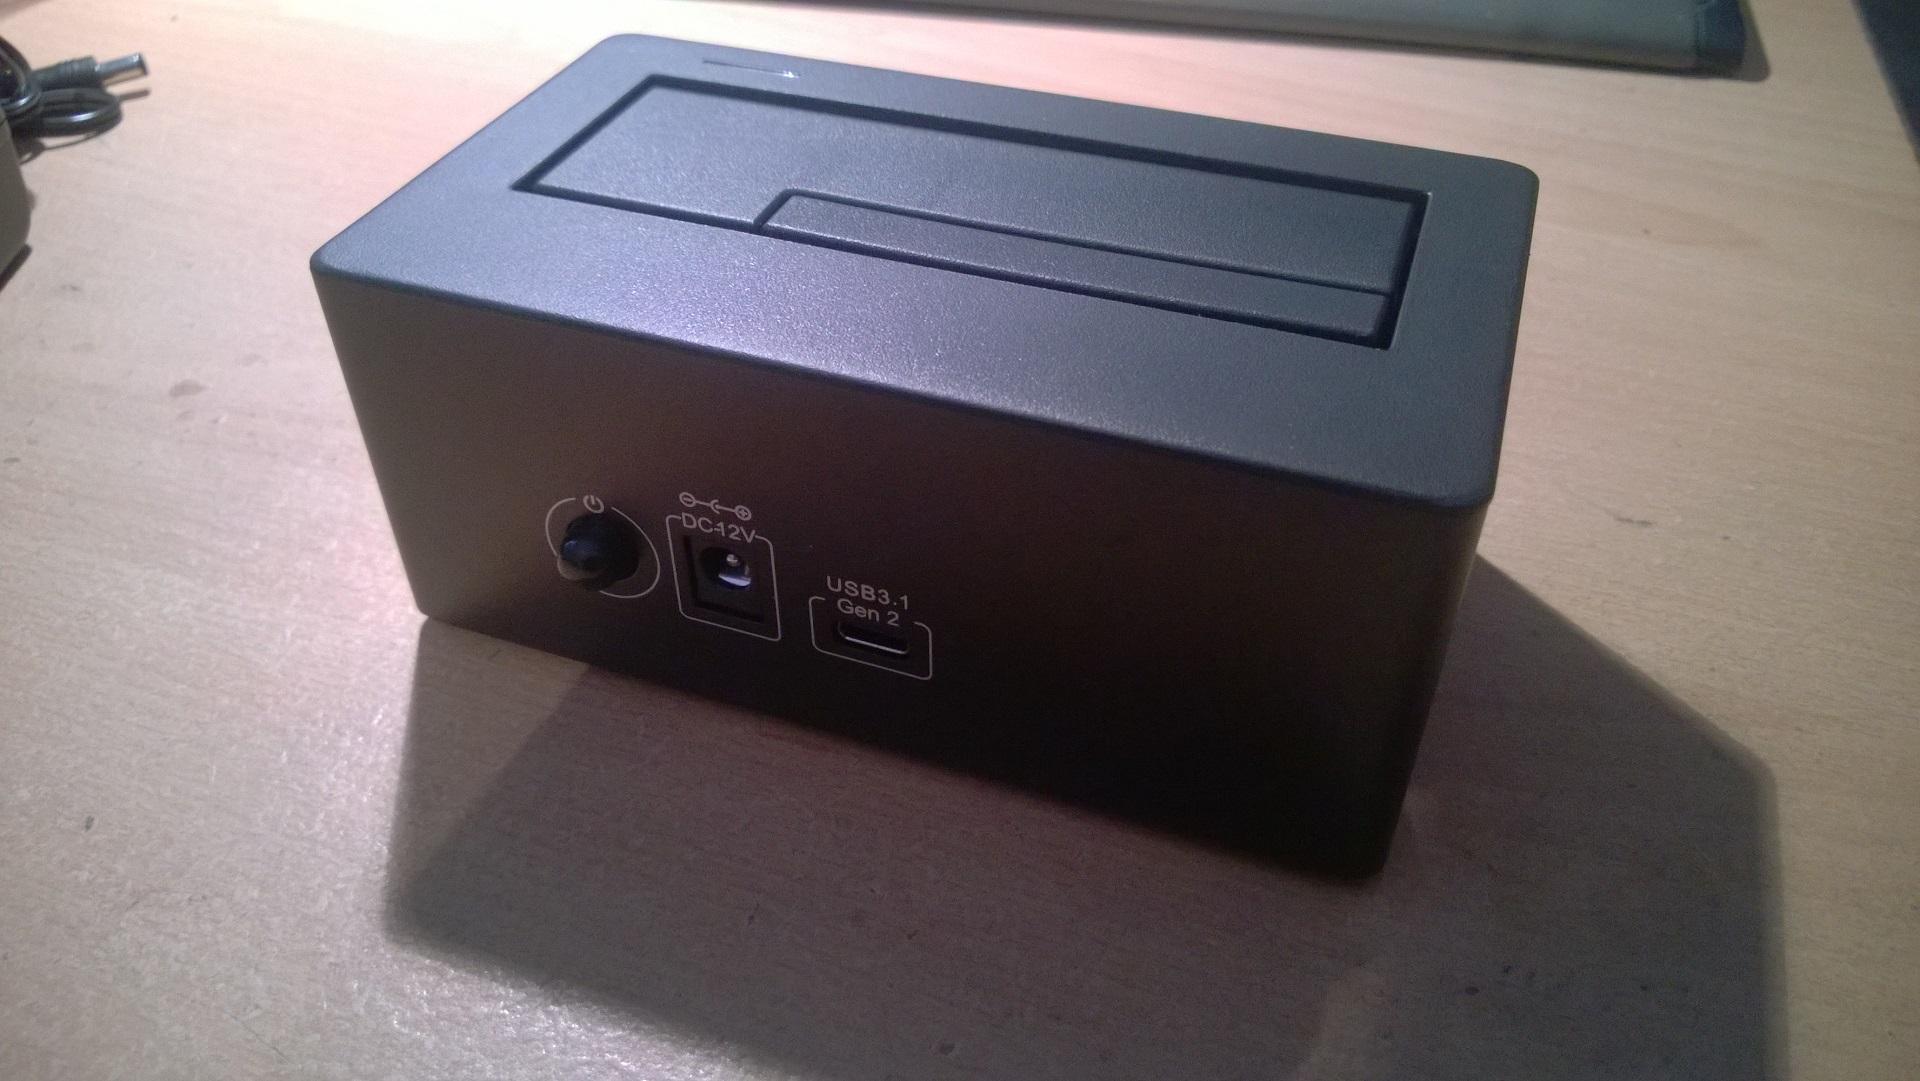 icy box IB-117-U31